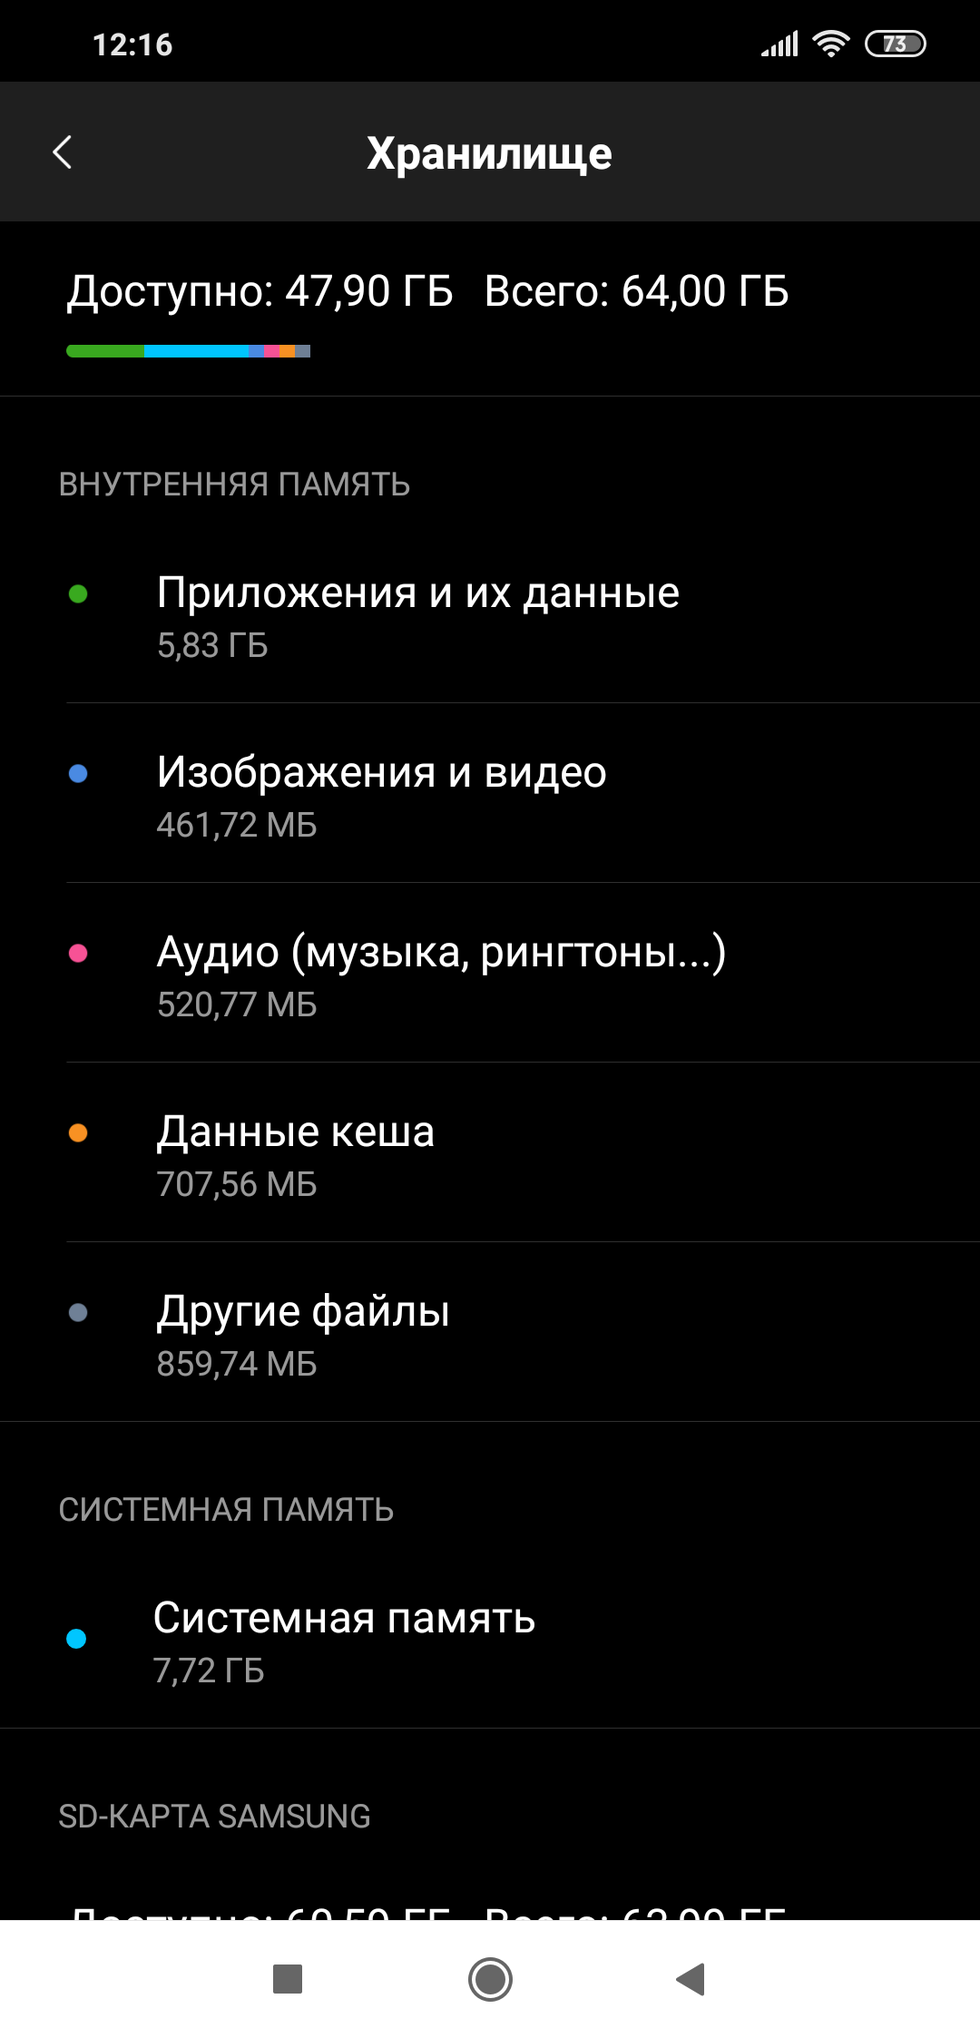 Screenshot_2019-01-12-12-16-22-247_com.android.settings.png